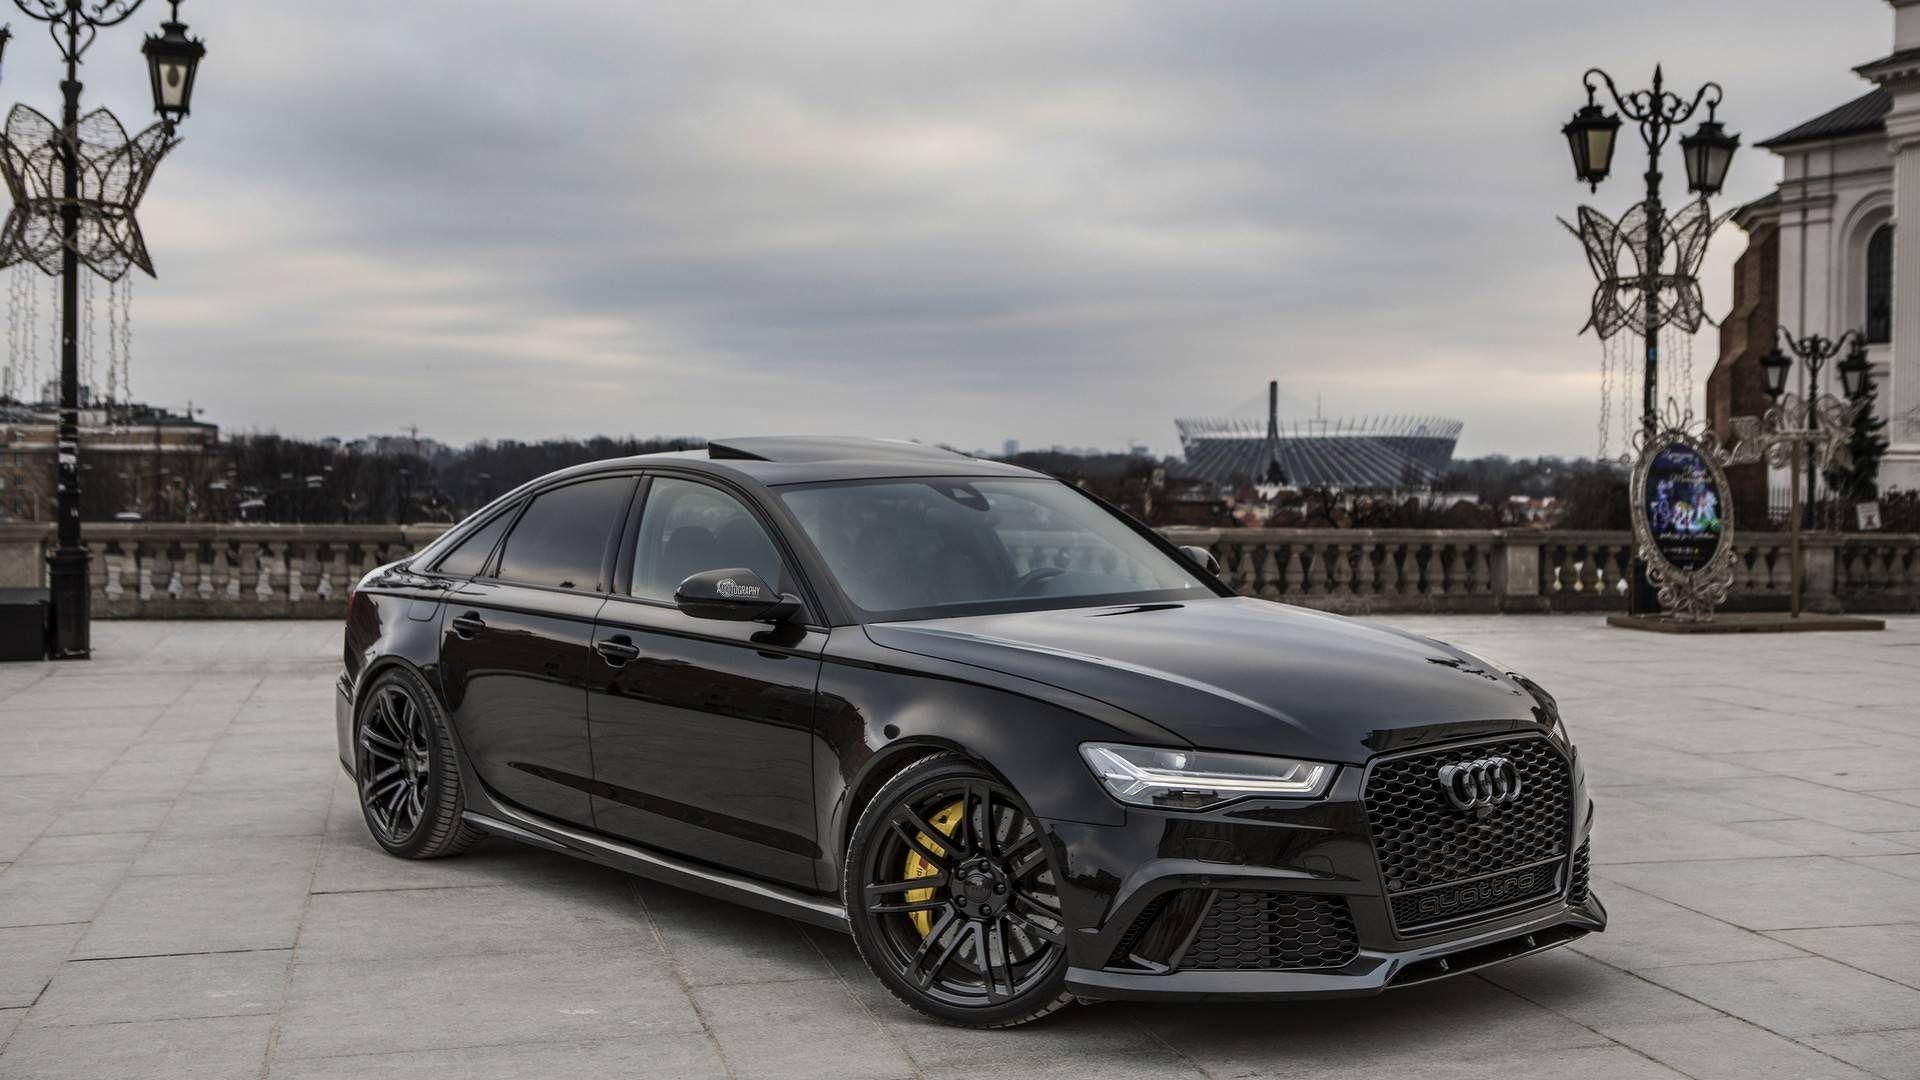 2020 Audi Rs4 Specs In 2020 Audi Rs6 Sedan Audi Sedan